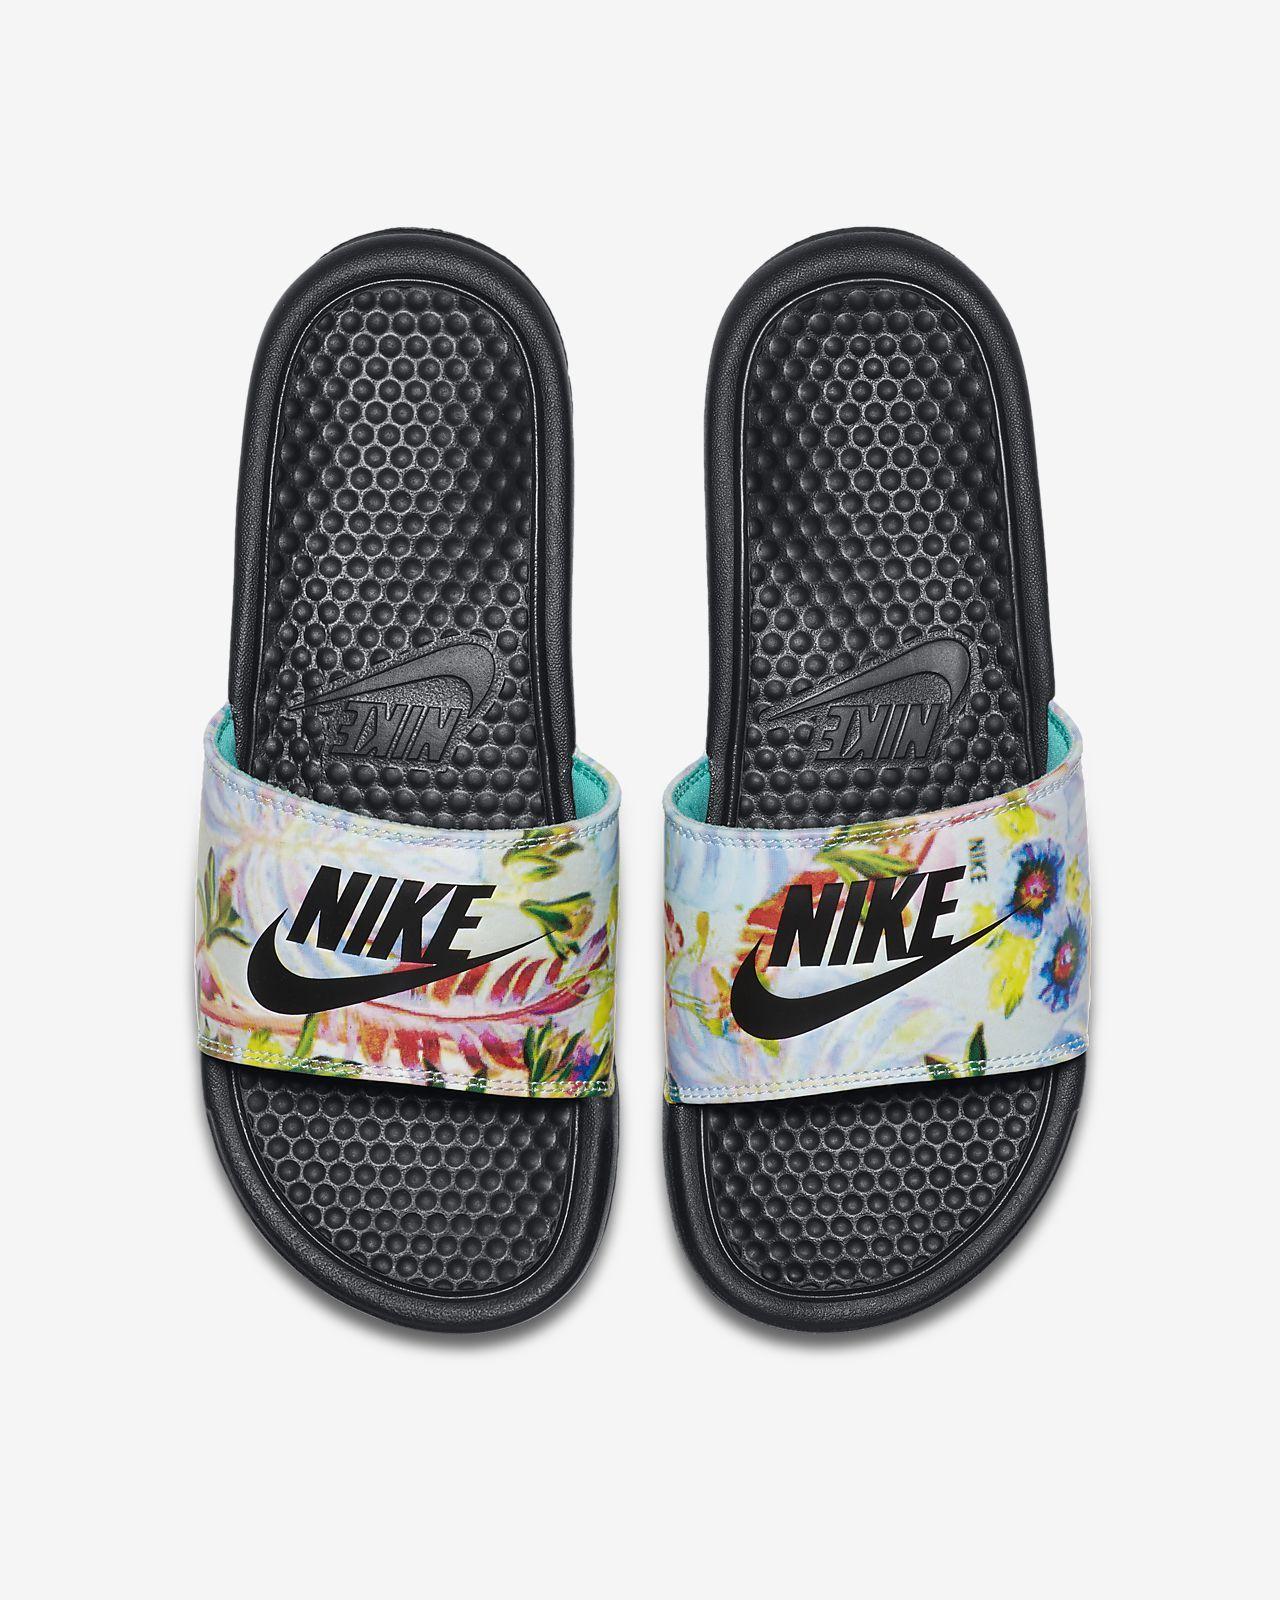 Benassi JDI Floral Chanclas - Mujer. Nike ES | Chanclas ...